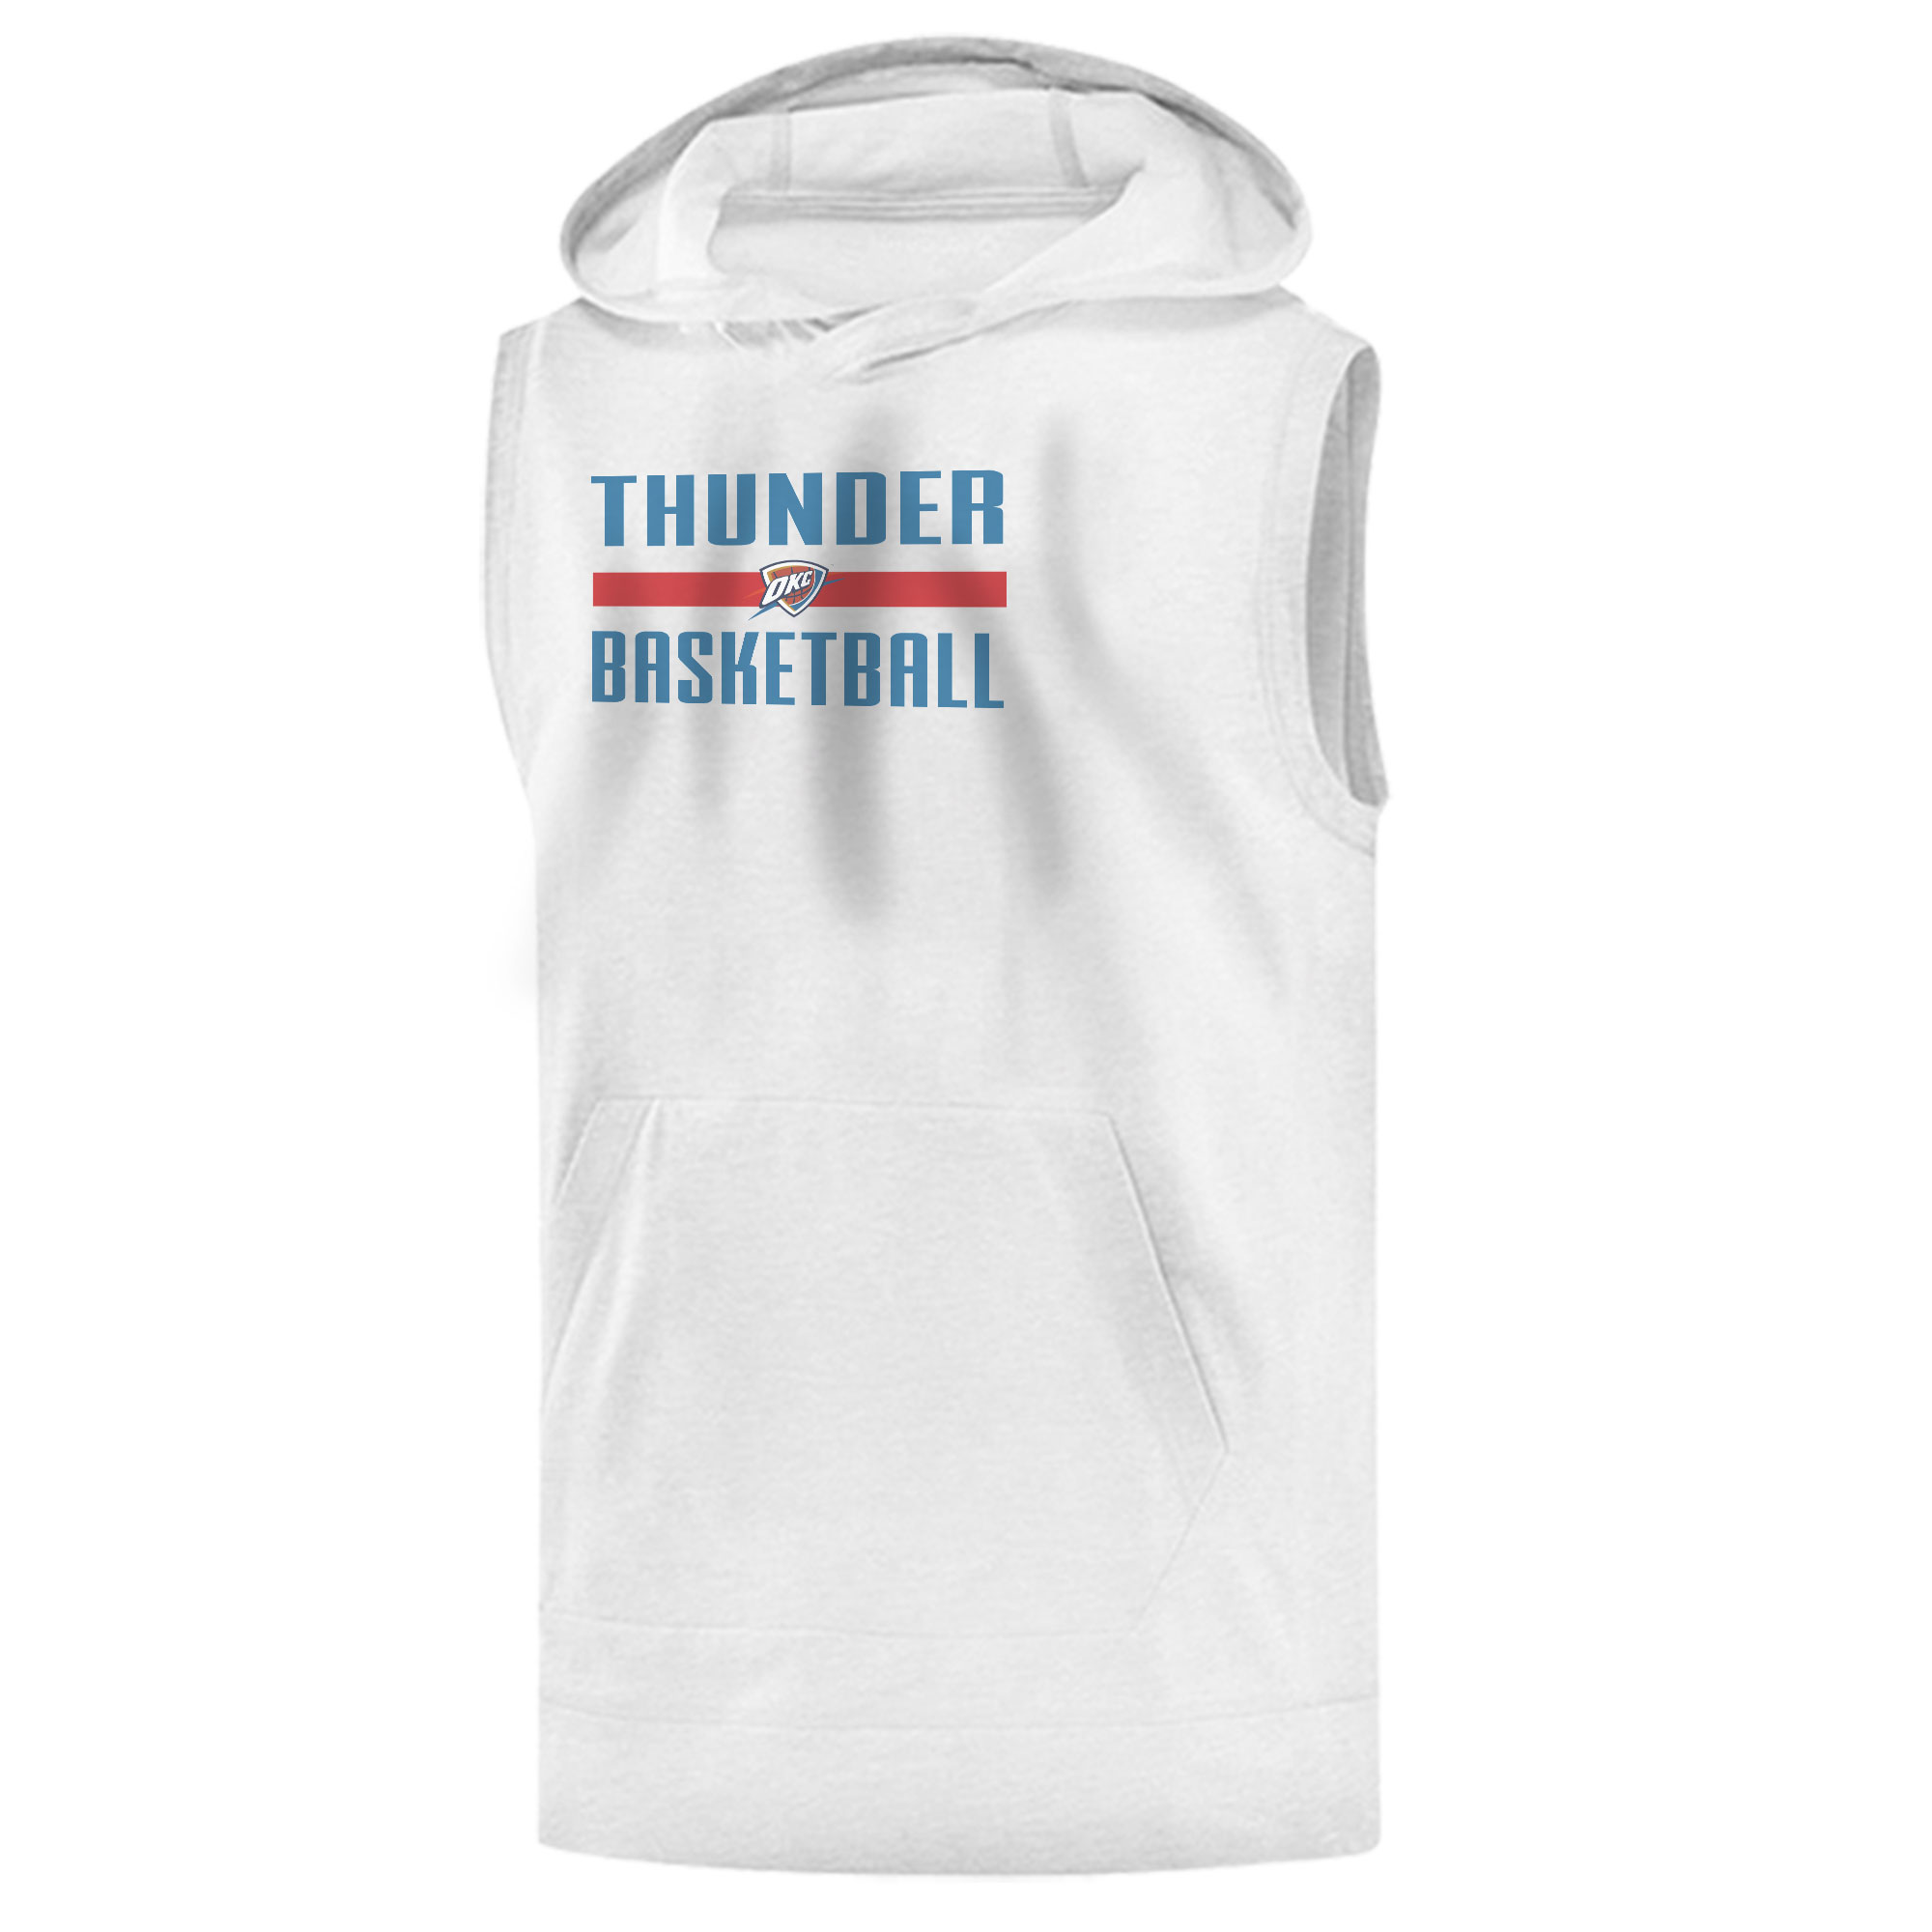 Oklahoma City Basketball Sleeveless (KLS-WHT-444-okc.bsktbll)